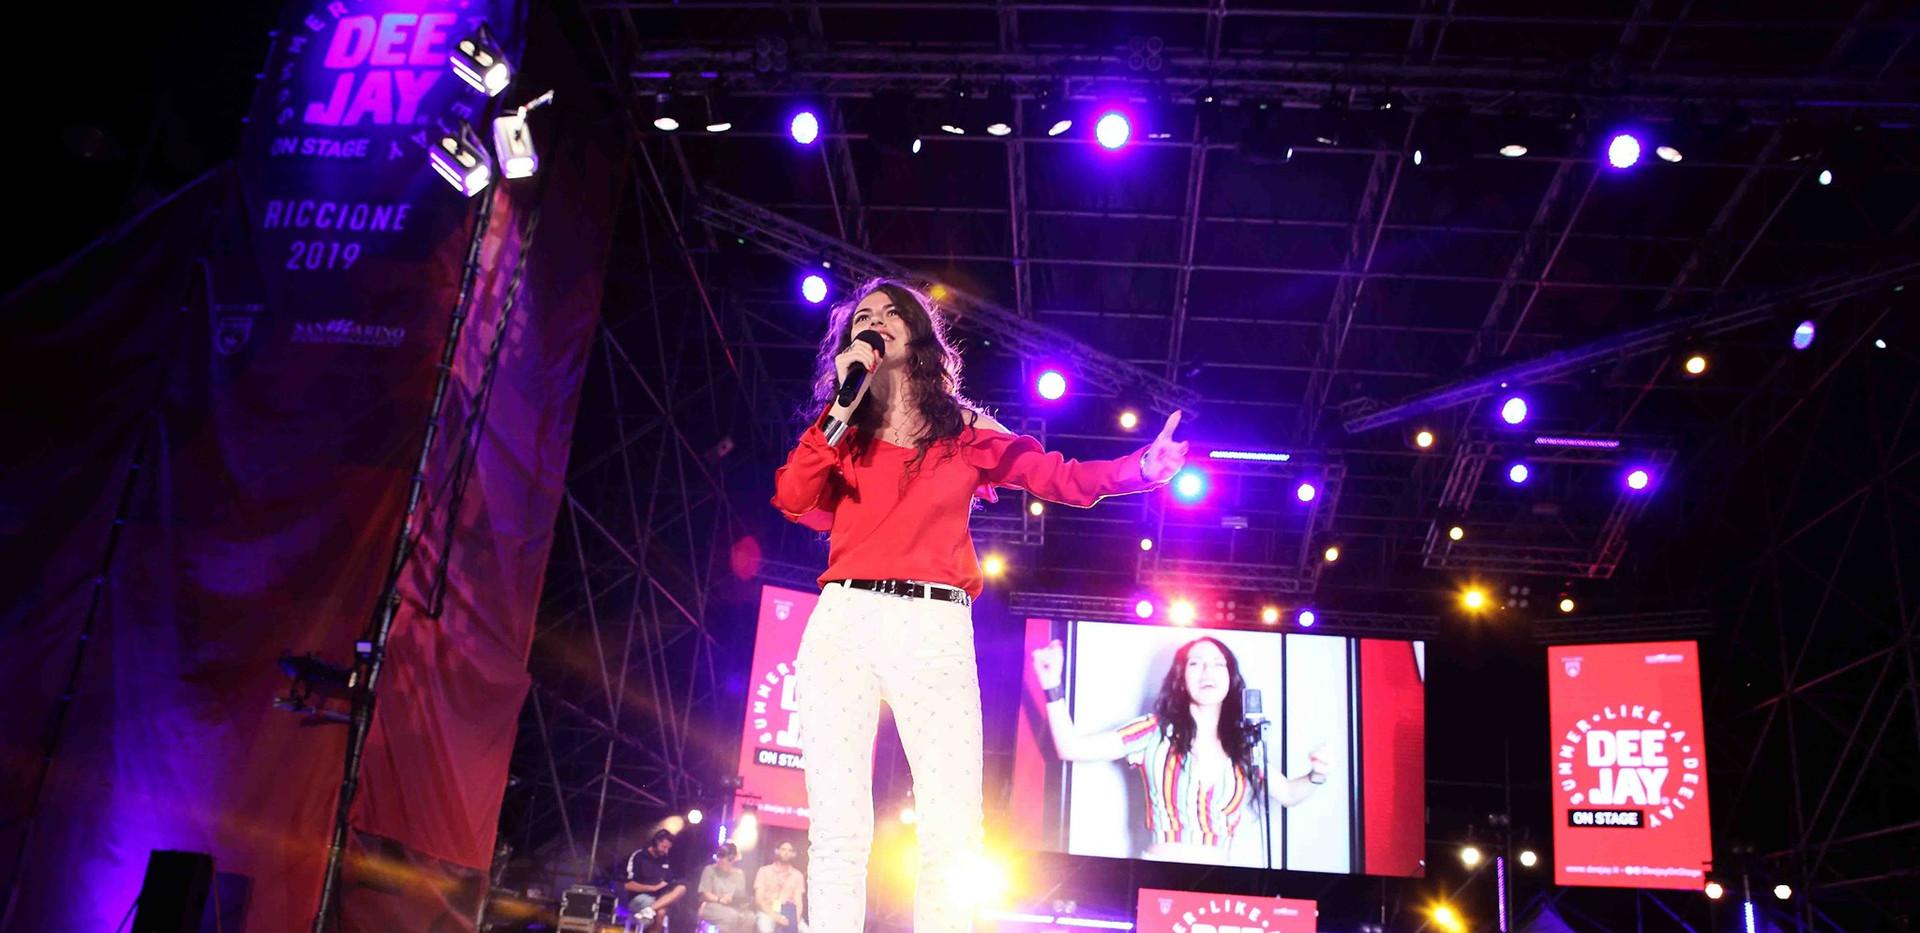 Silvia deejay on stage 7.jpg